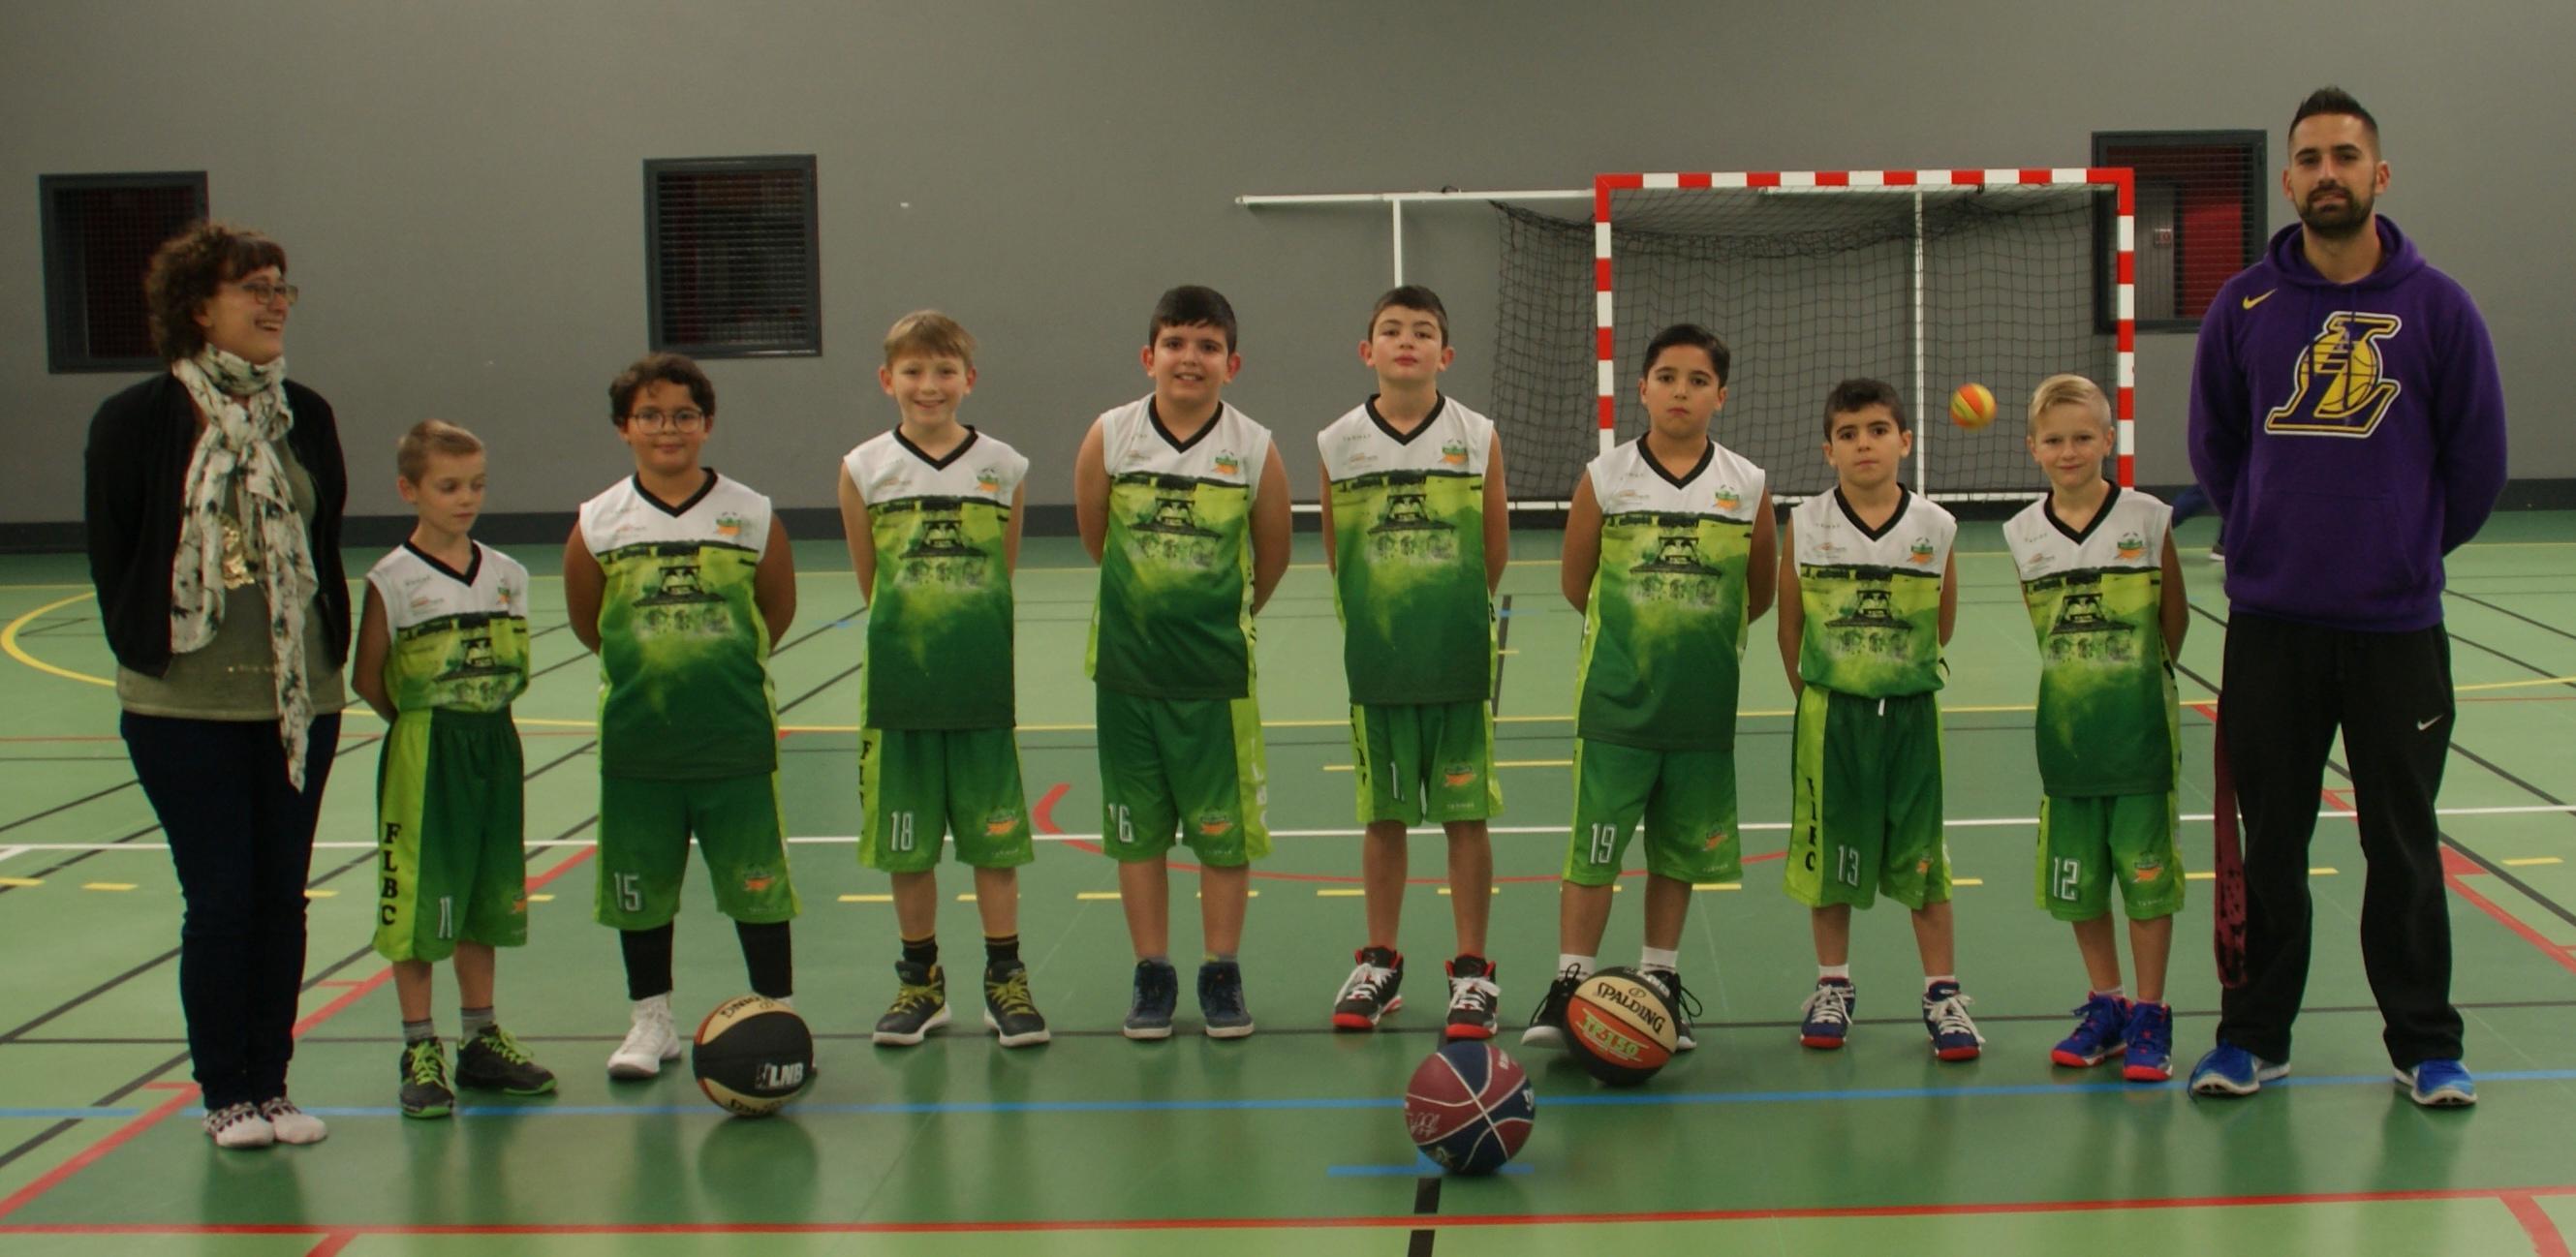 U11 M - FL Basket Chambon - Équipes